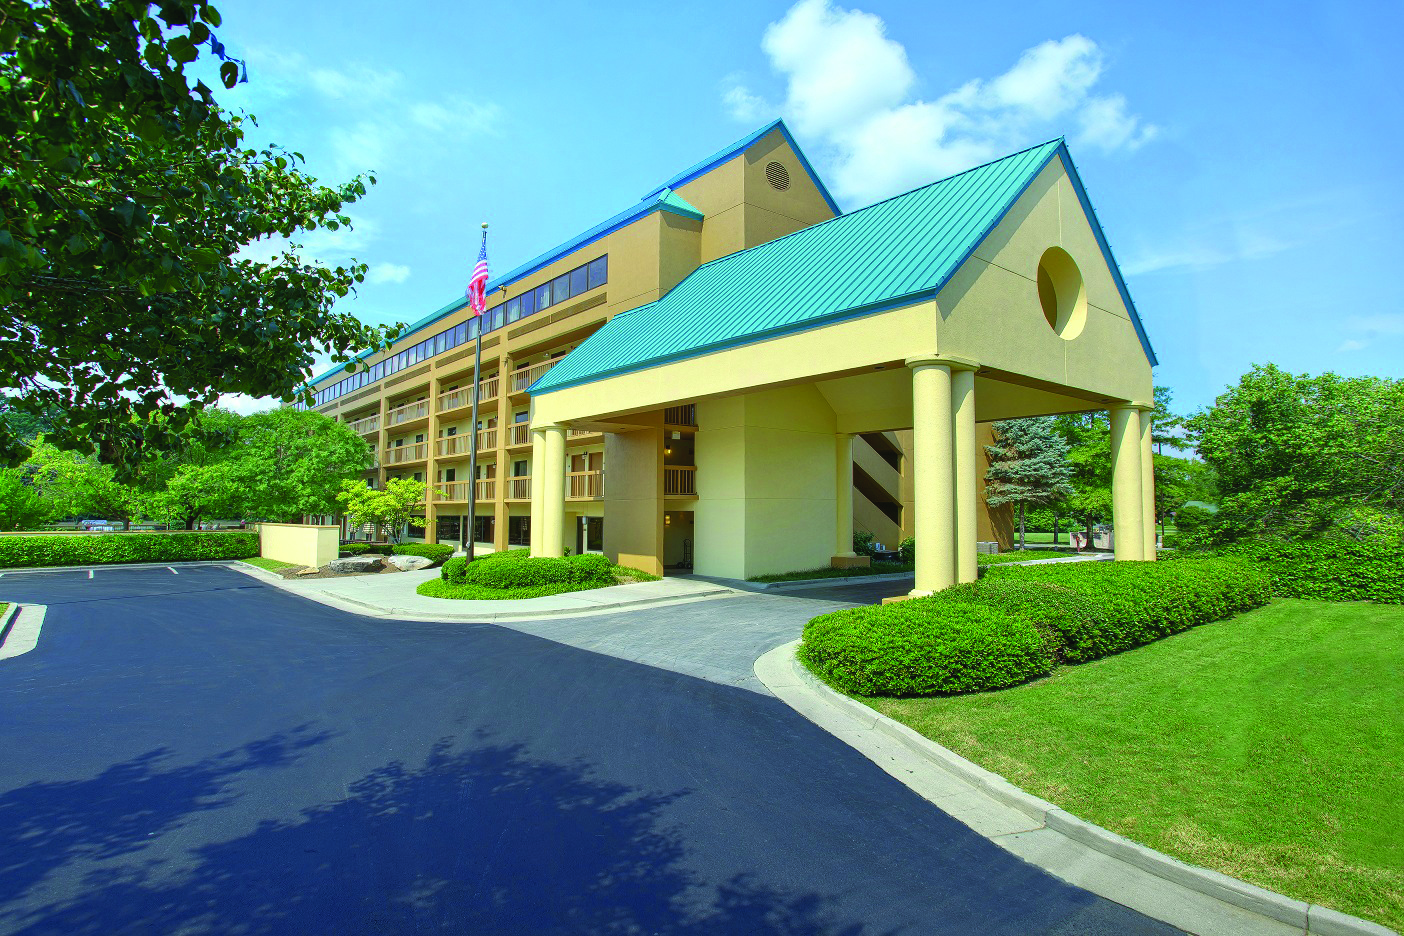 Shular Inn - Back Building - Angle - Small.jpg